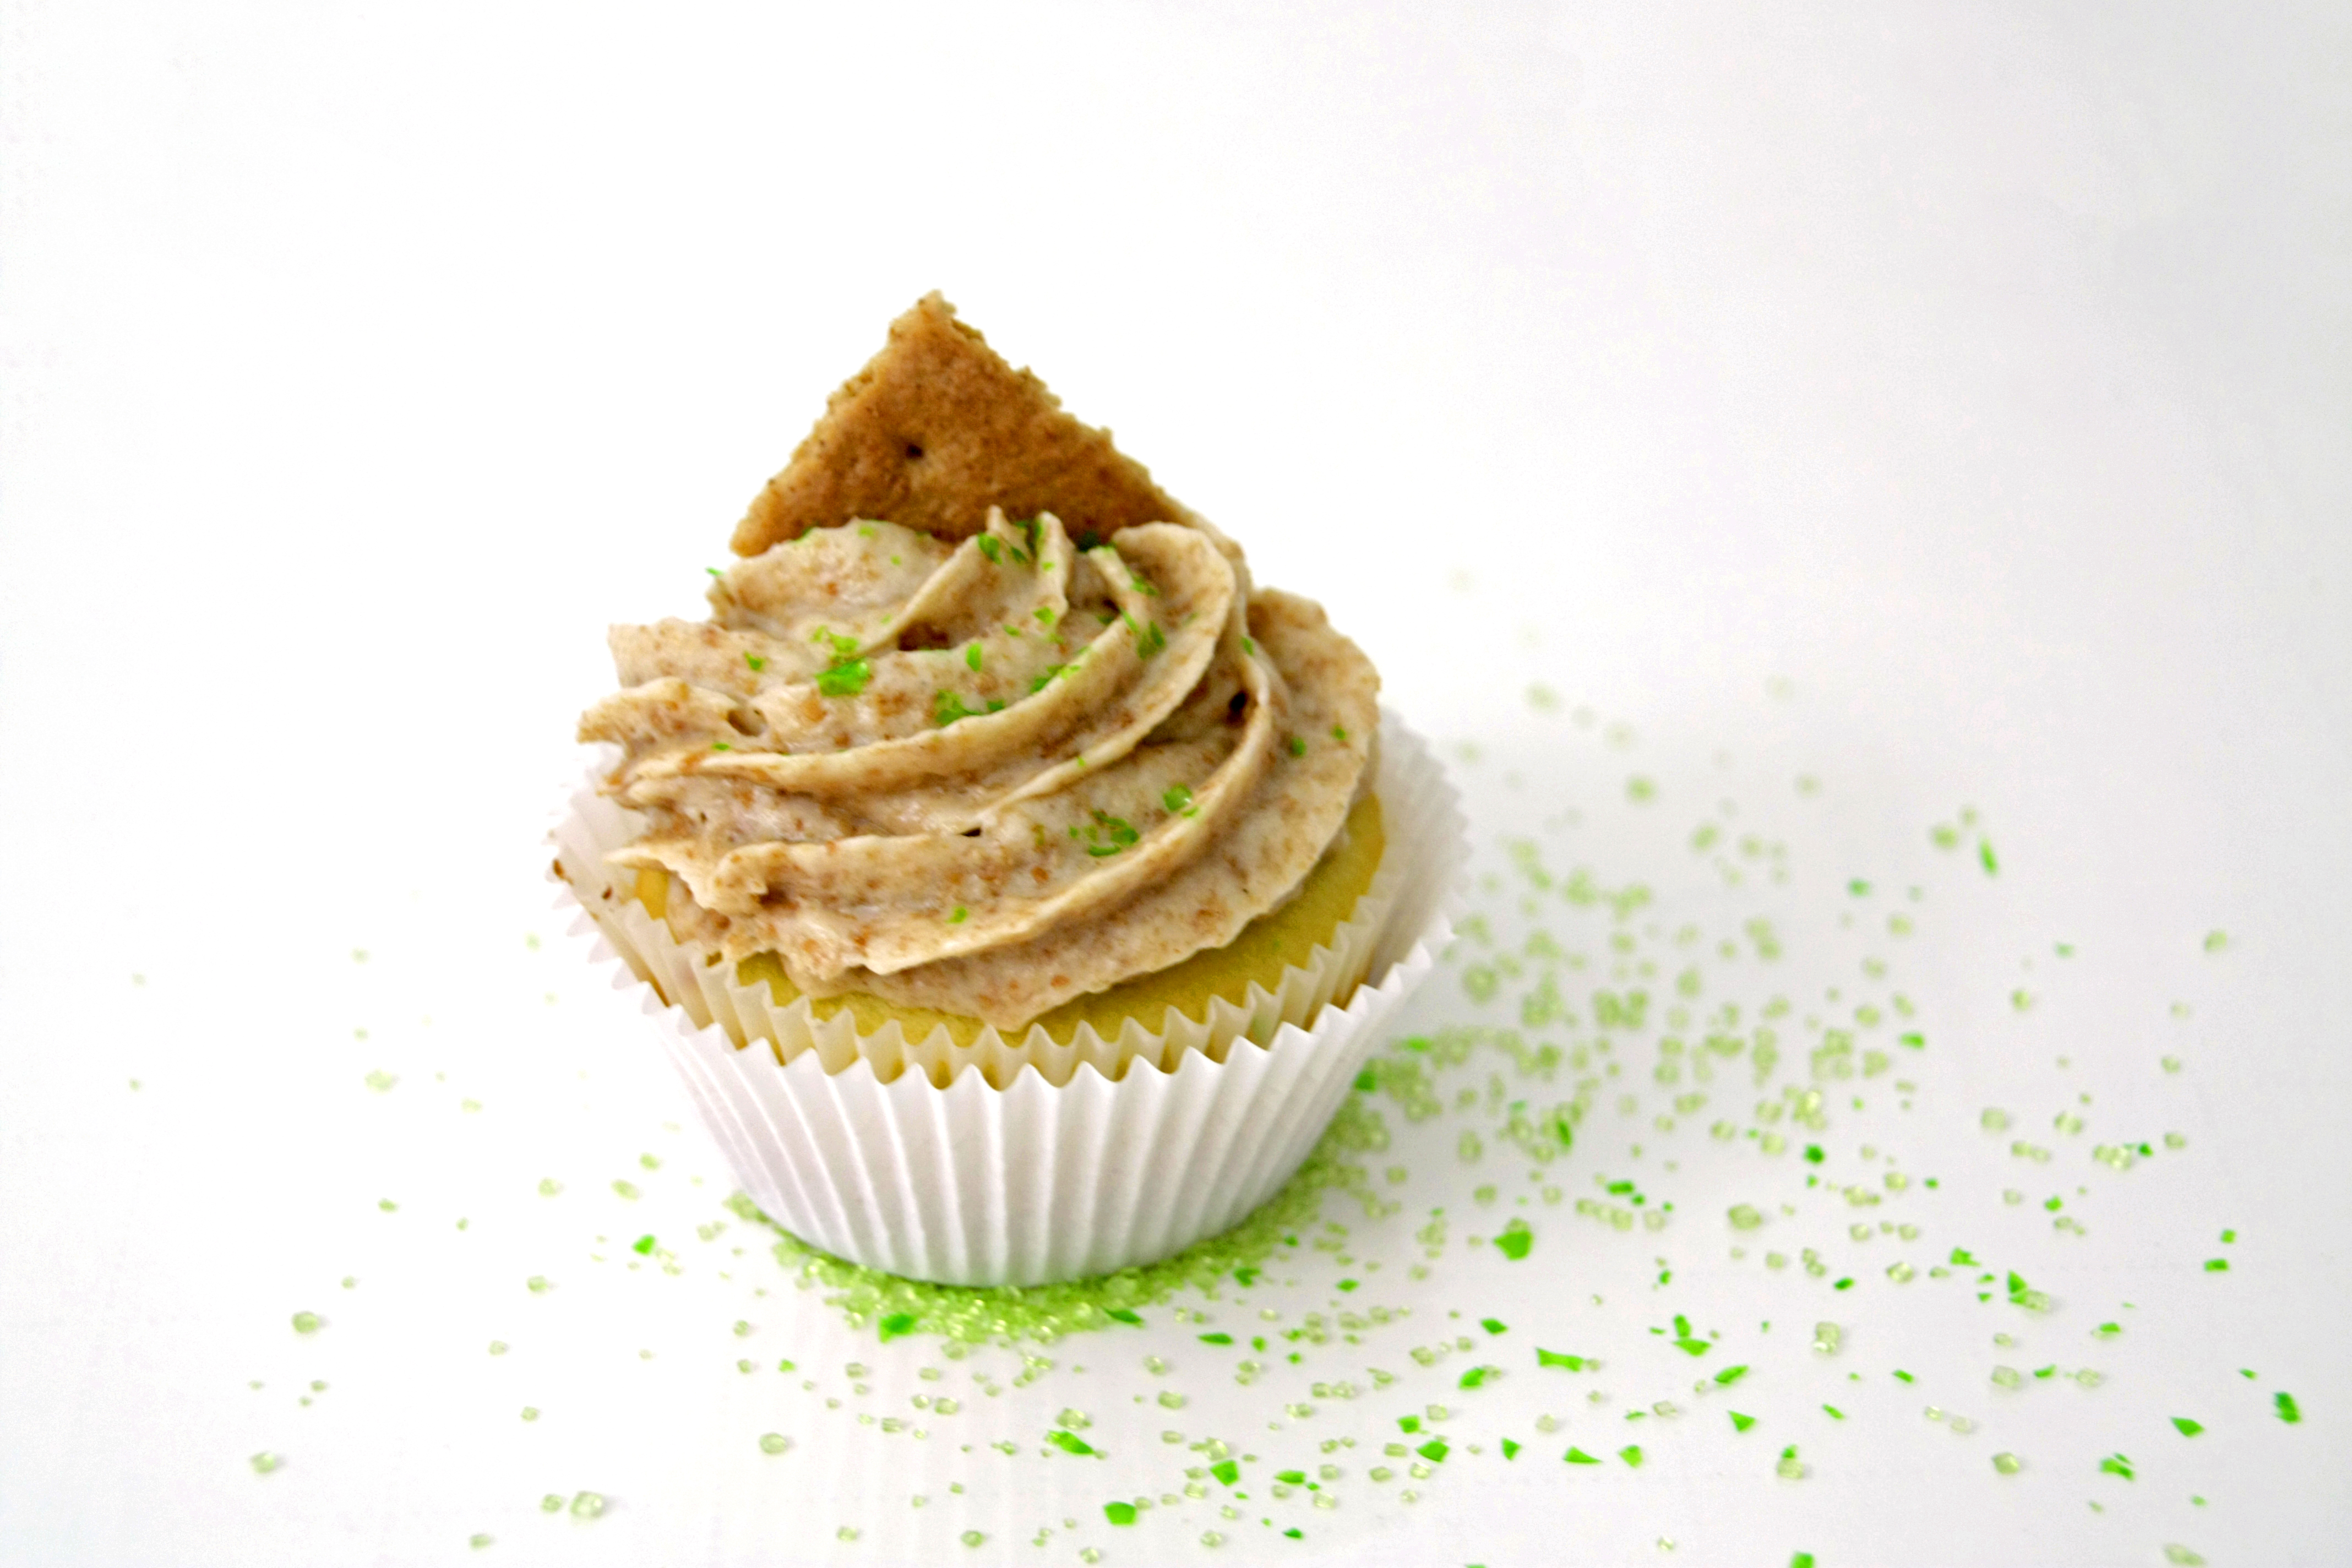 cupcake-KEY LIME-08 03 13_2704